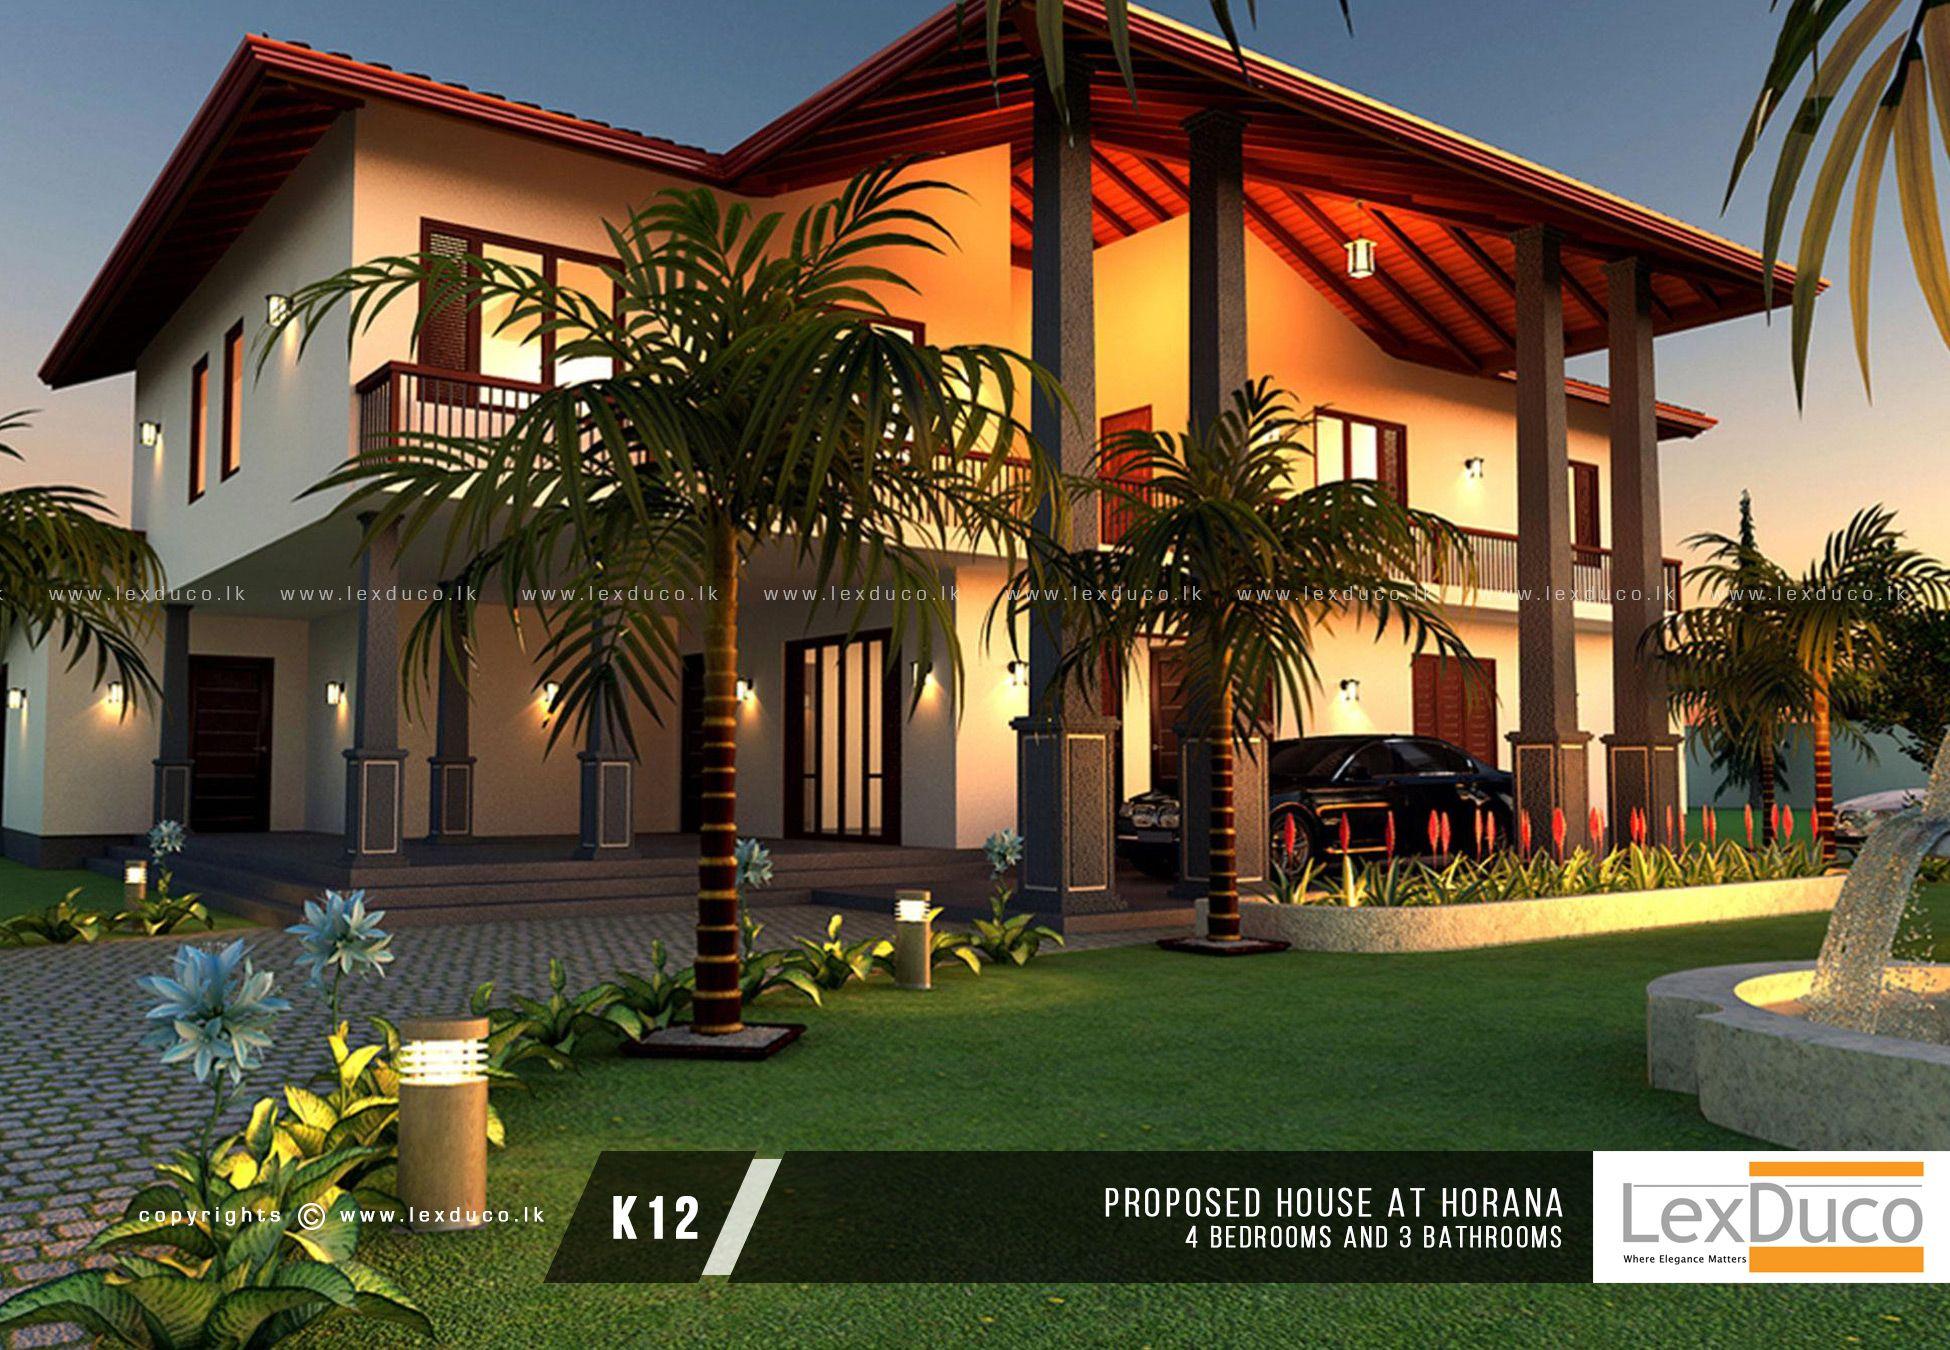 houses image by Asanka Mudannayake | Two storey house ...